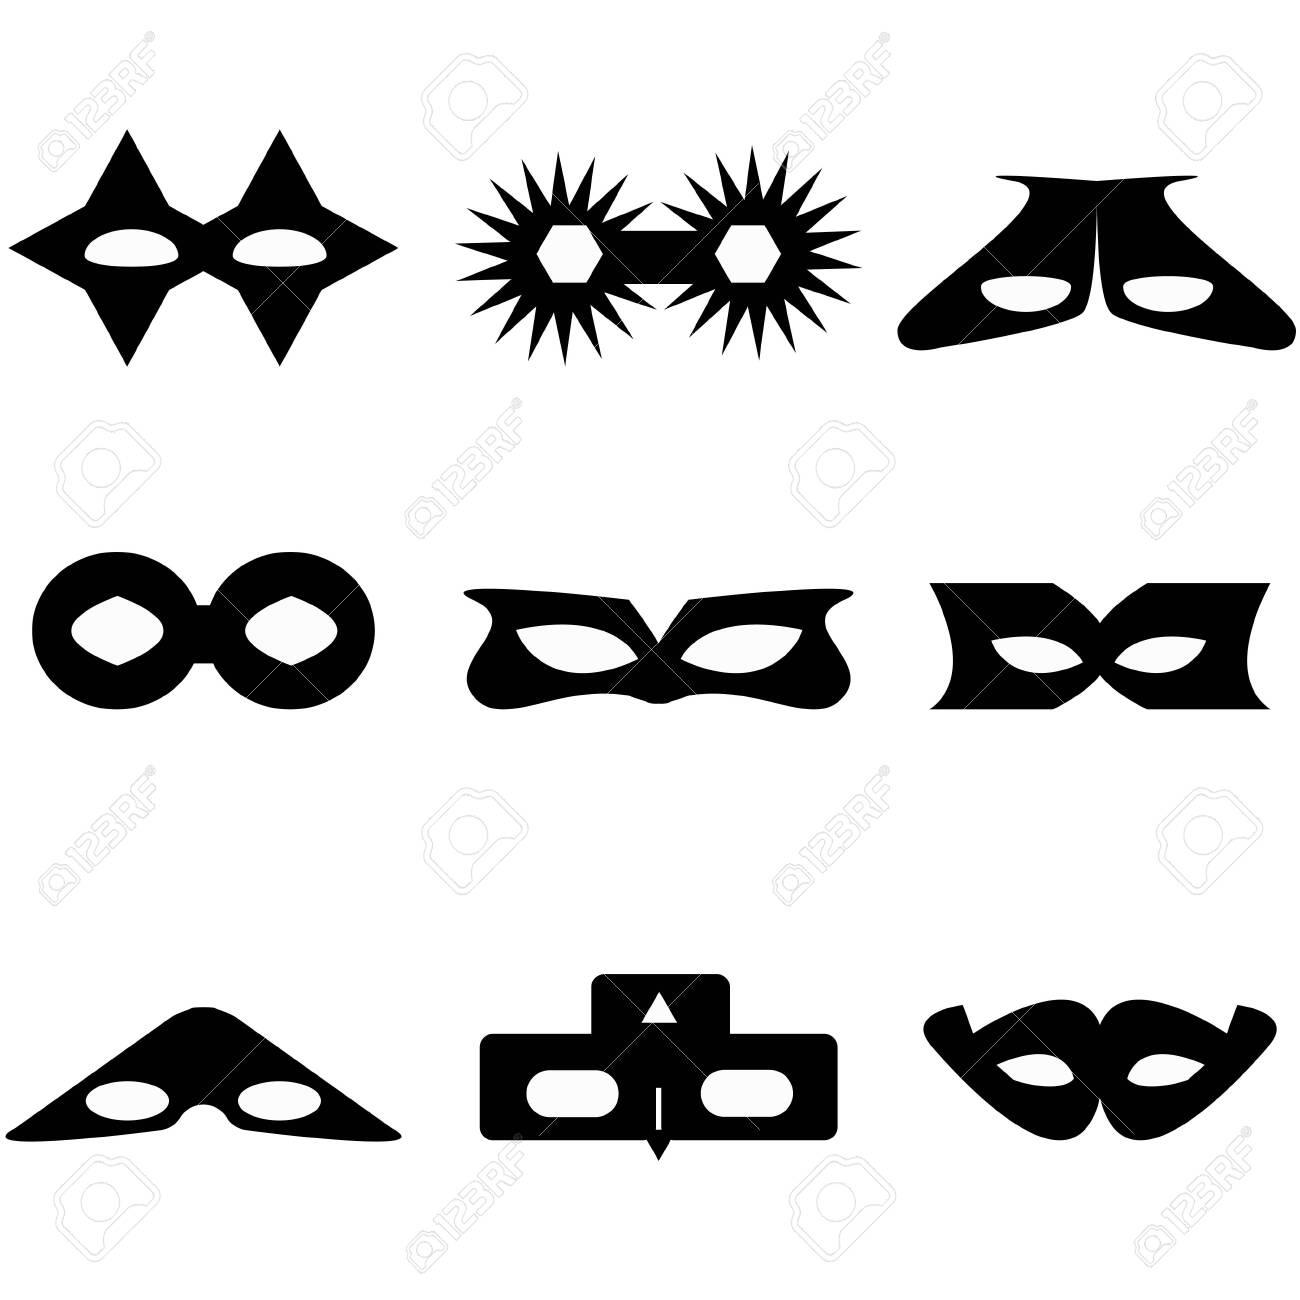 bandit or superhero mask - 124534031